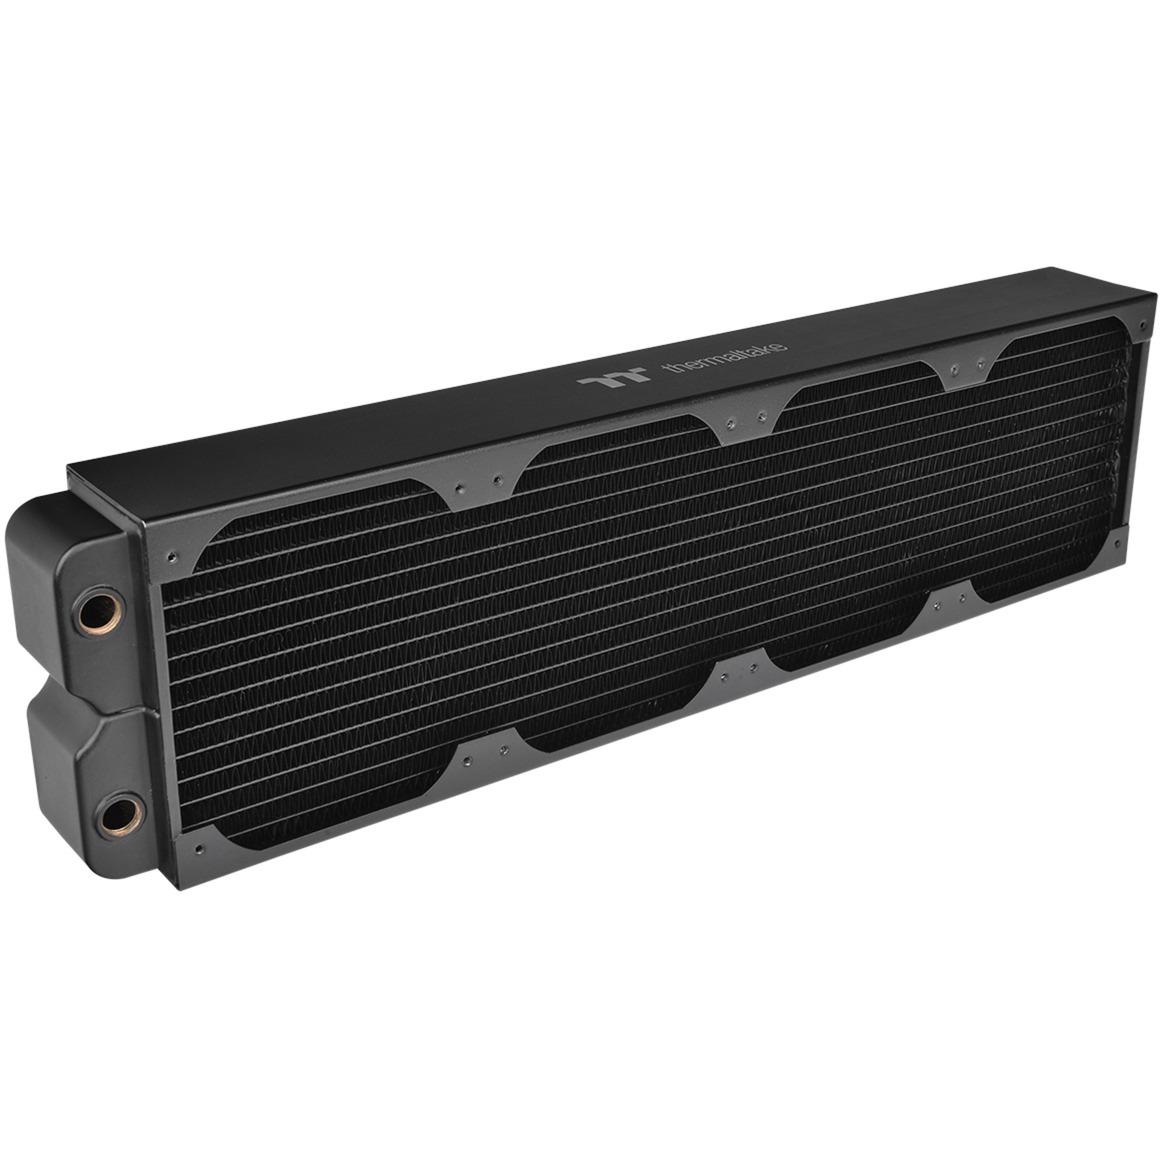 CL480 Negro, Radiador